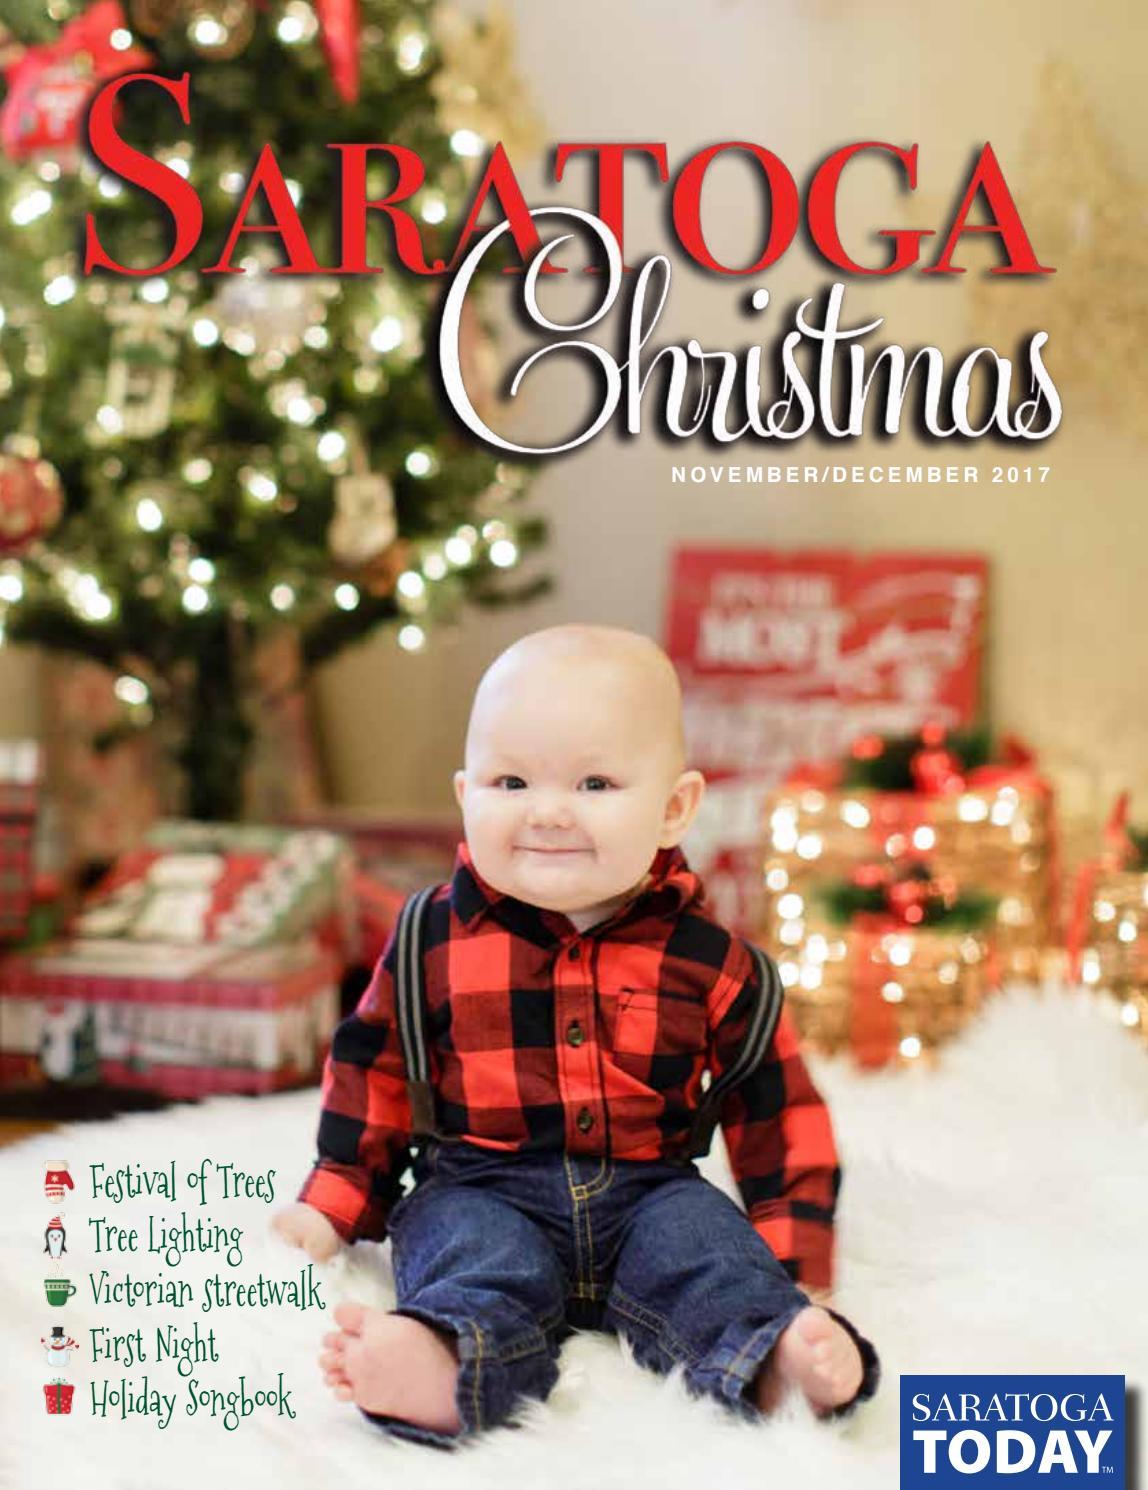 Saratoga Christmas 2017 by Saratoga TODAY - issuu